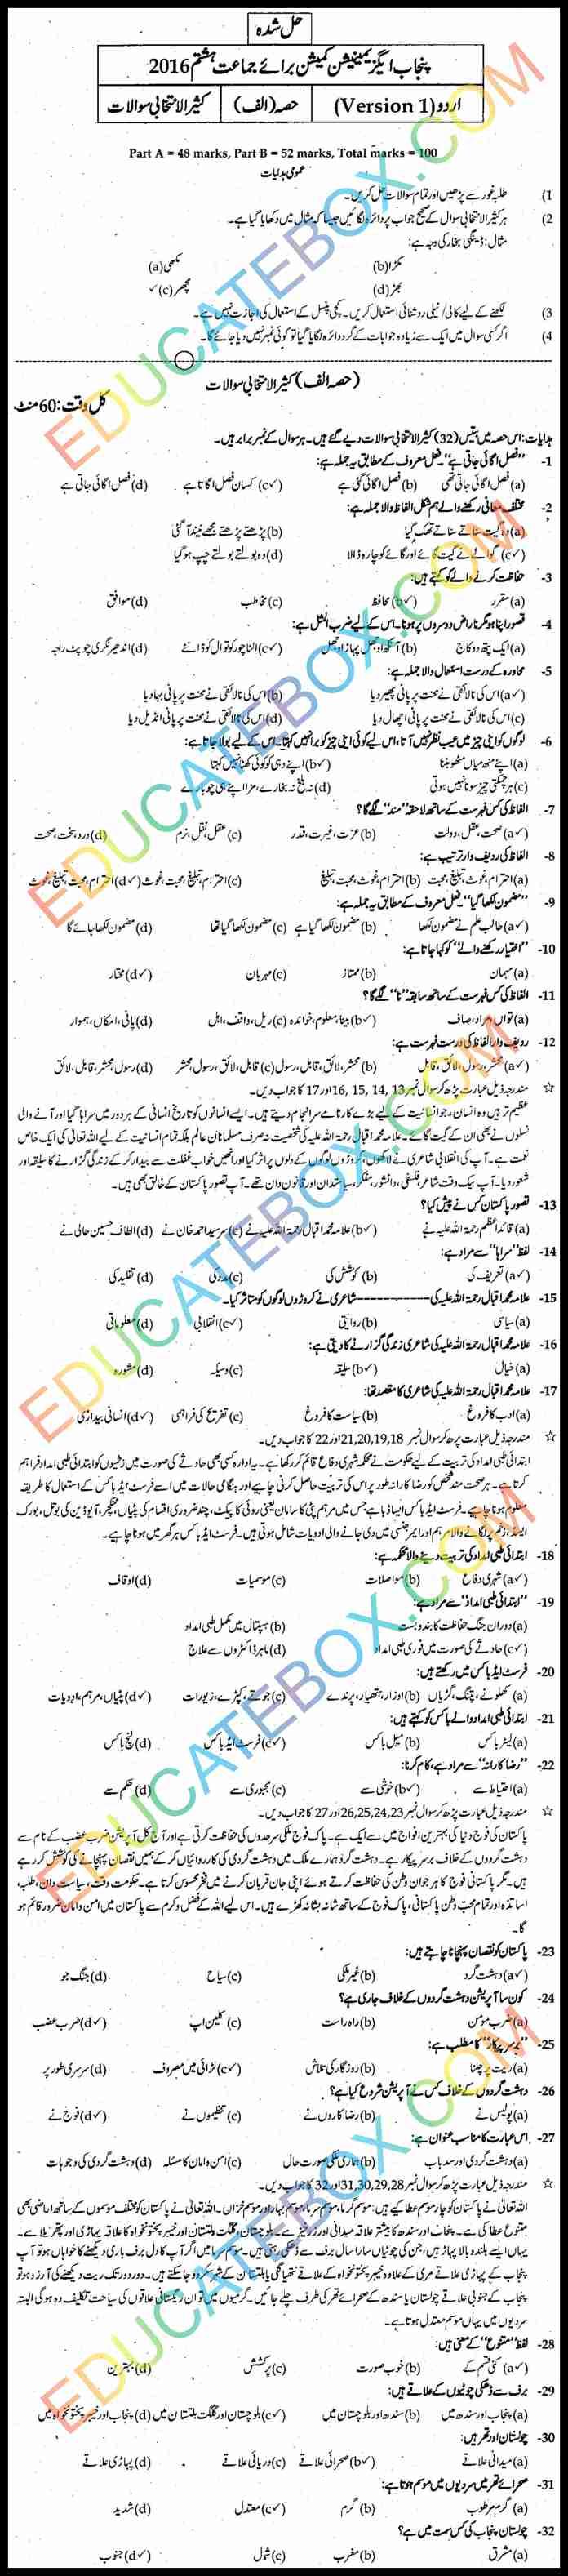 Past Paper 8th Class Urdu 2016 Solved Paper Punjab Board (PEC) Objective Type Version 1 اپ ٹو ڈیٹ پیپر آٹھویں کلاس اردو 2016 حل شدہ پیپر پنجاب بورڈ معروضی طرز۔ ورژن1